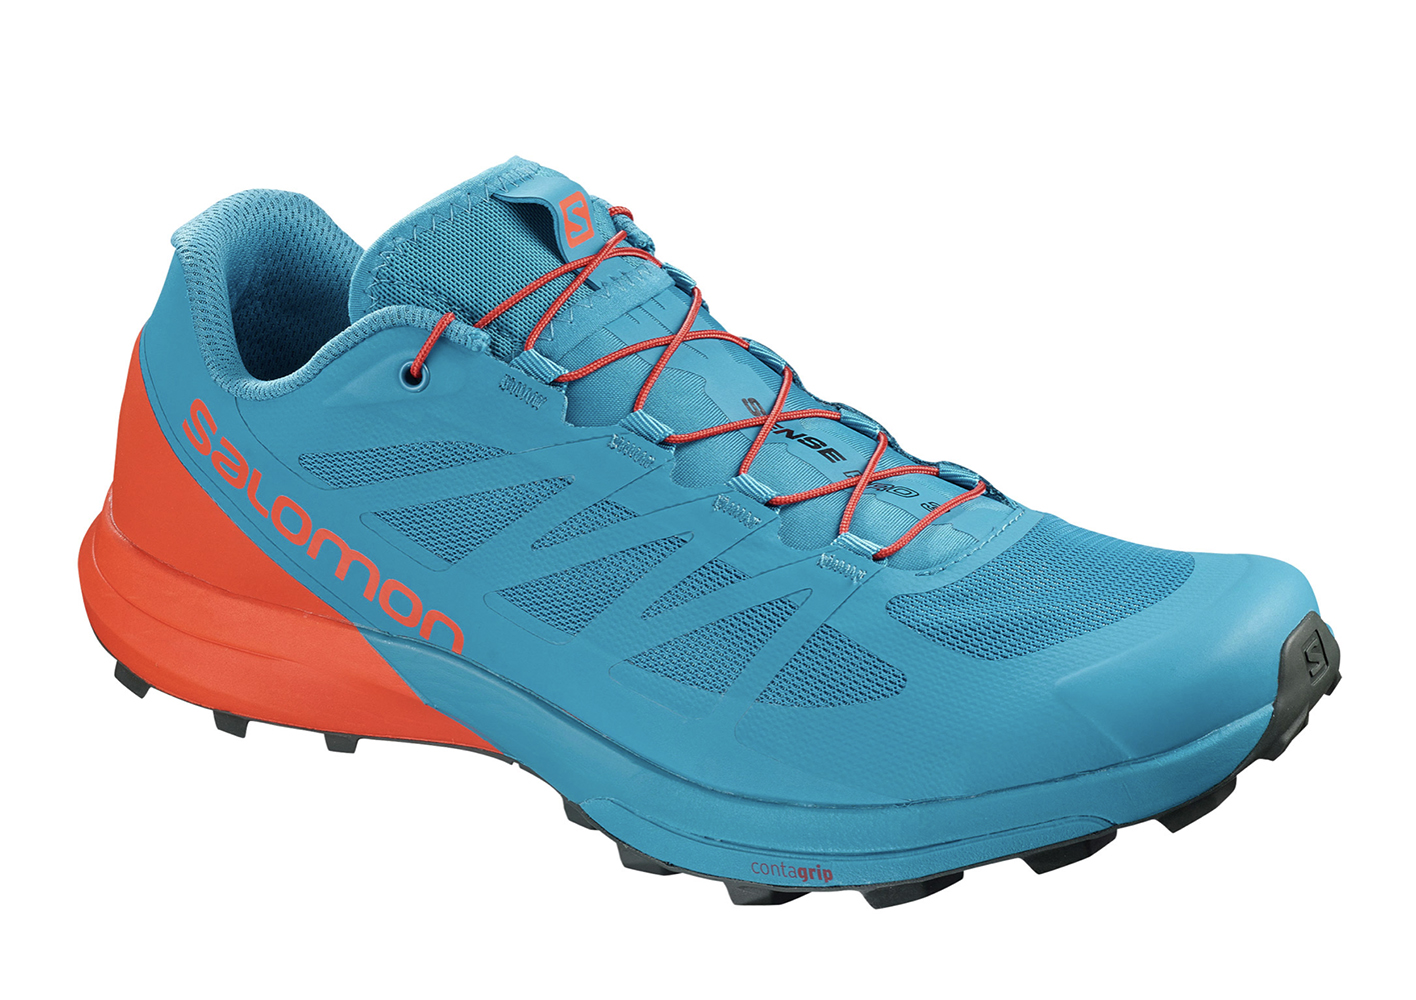 Salomon Mens Sense Pro 3 Trail Running Shoes Trainers Sneakers Black Sports